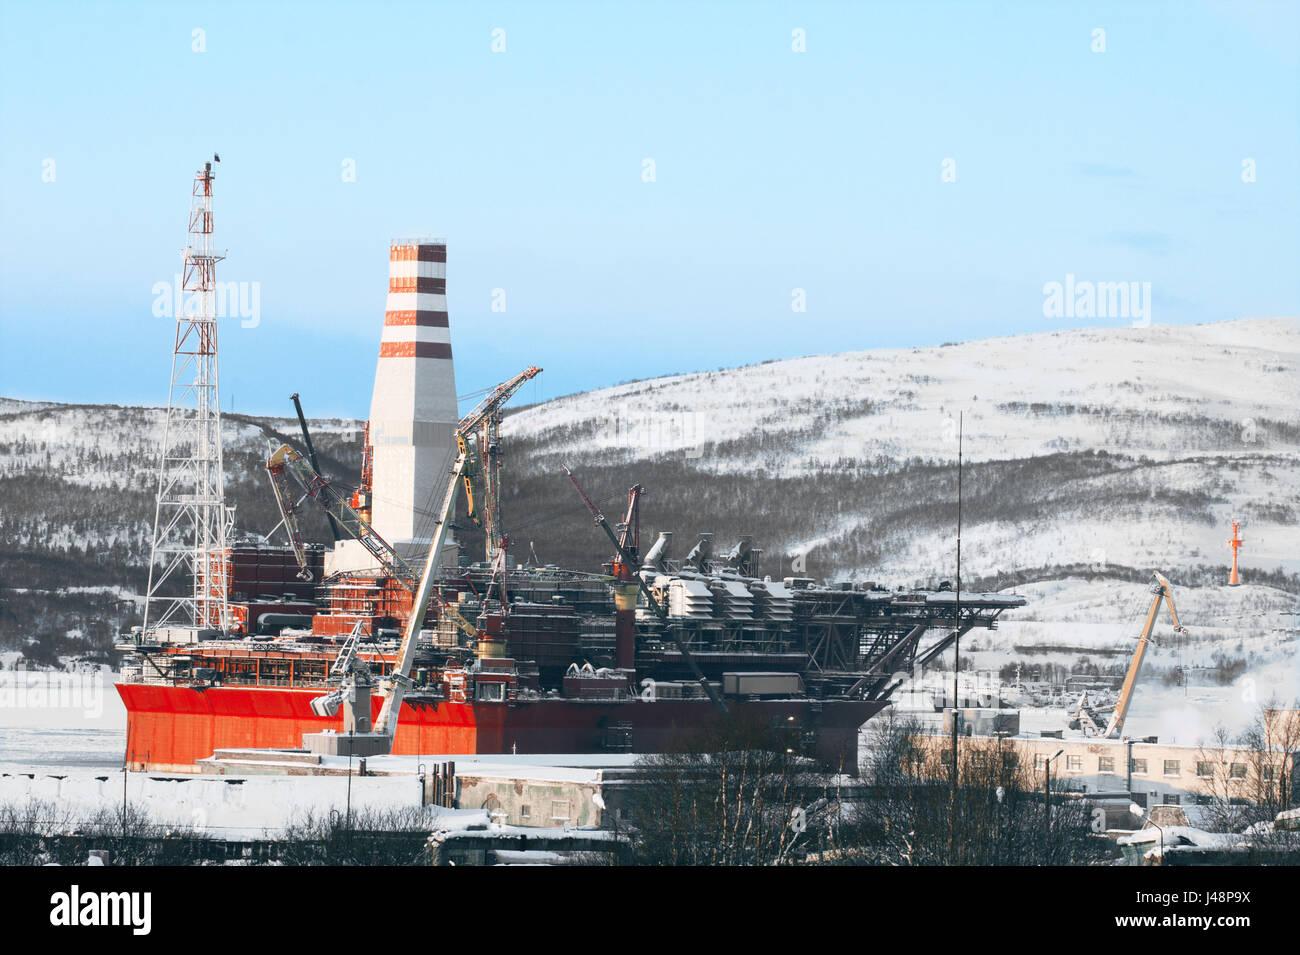 The offshore ice-resistant stationary platform Prirazlomnaya to Shipyard no. 35 outside Murmansk. - Stock Image